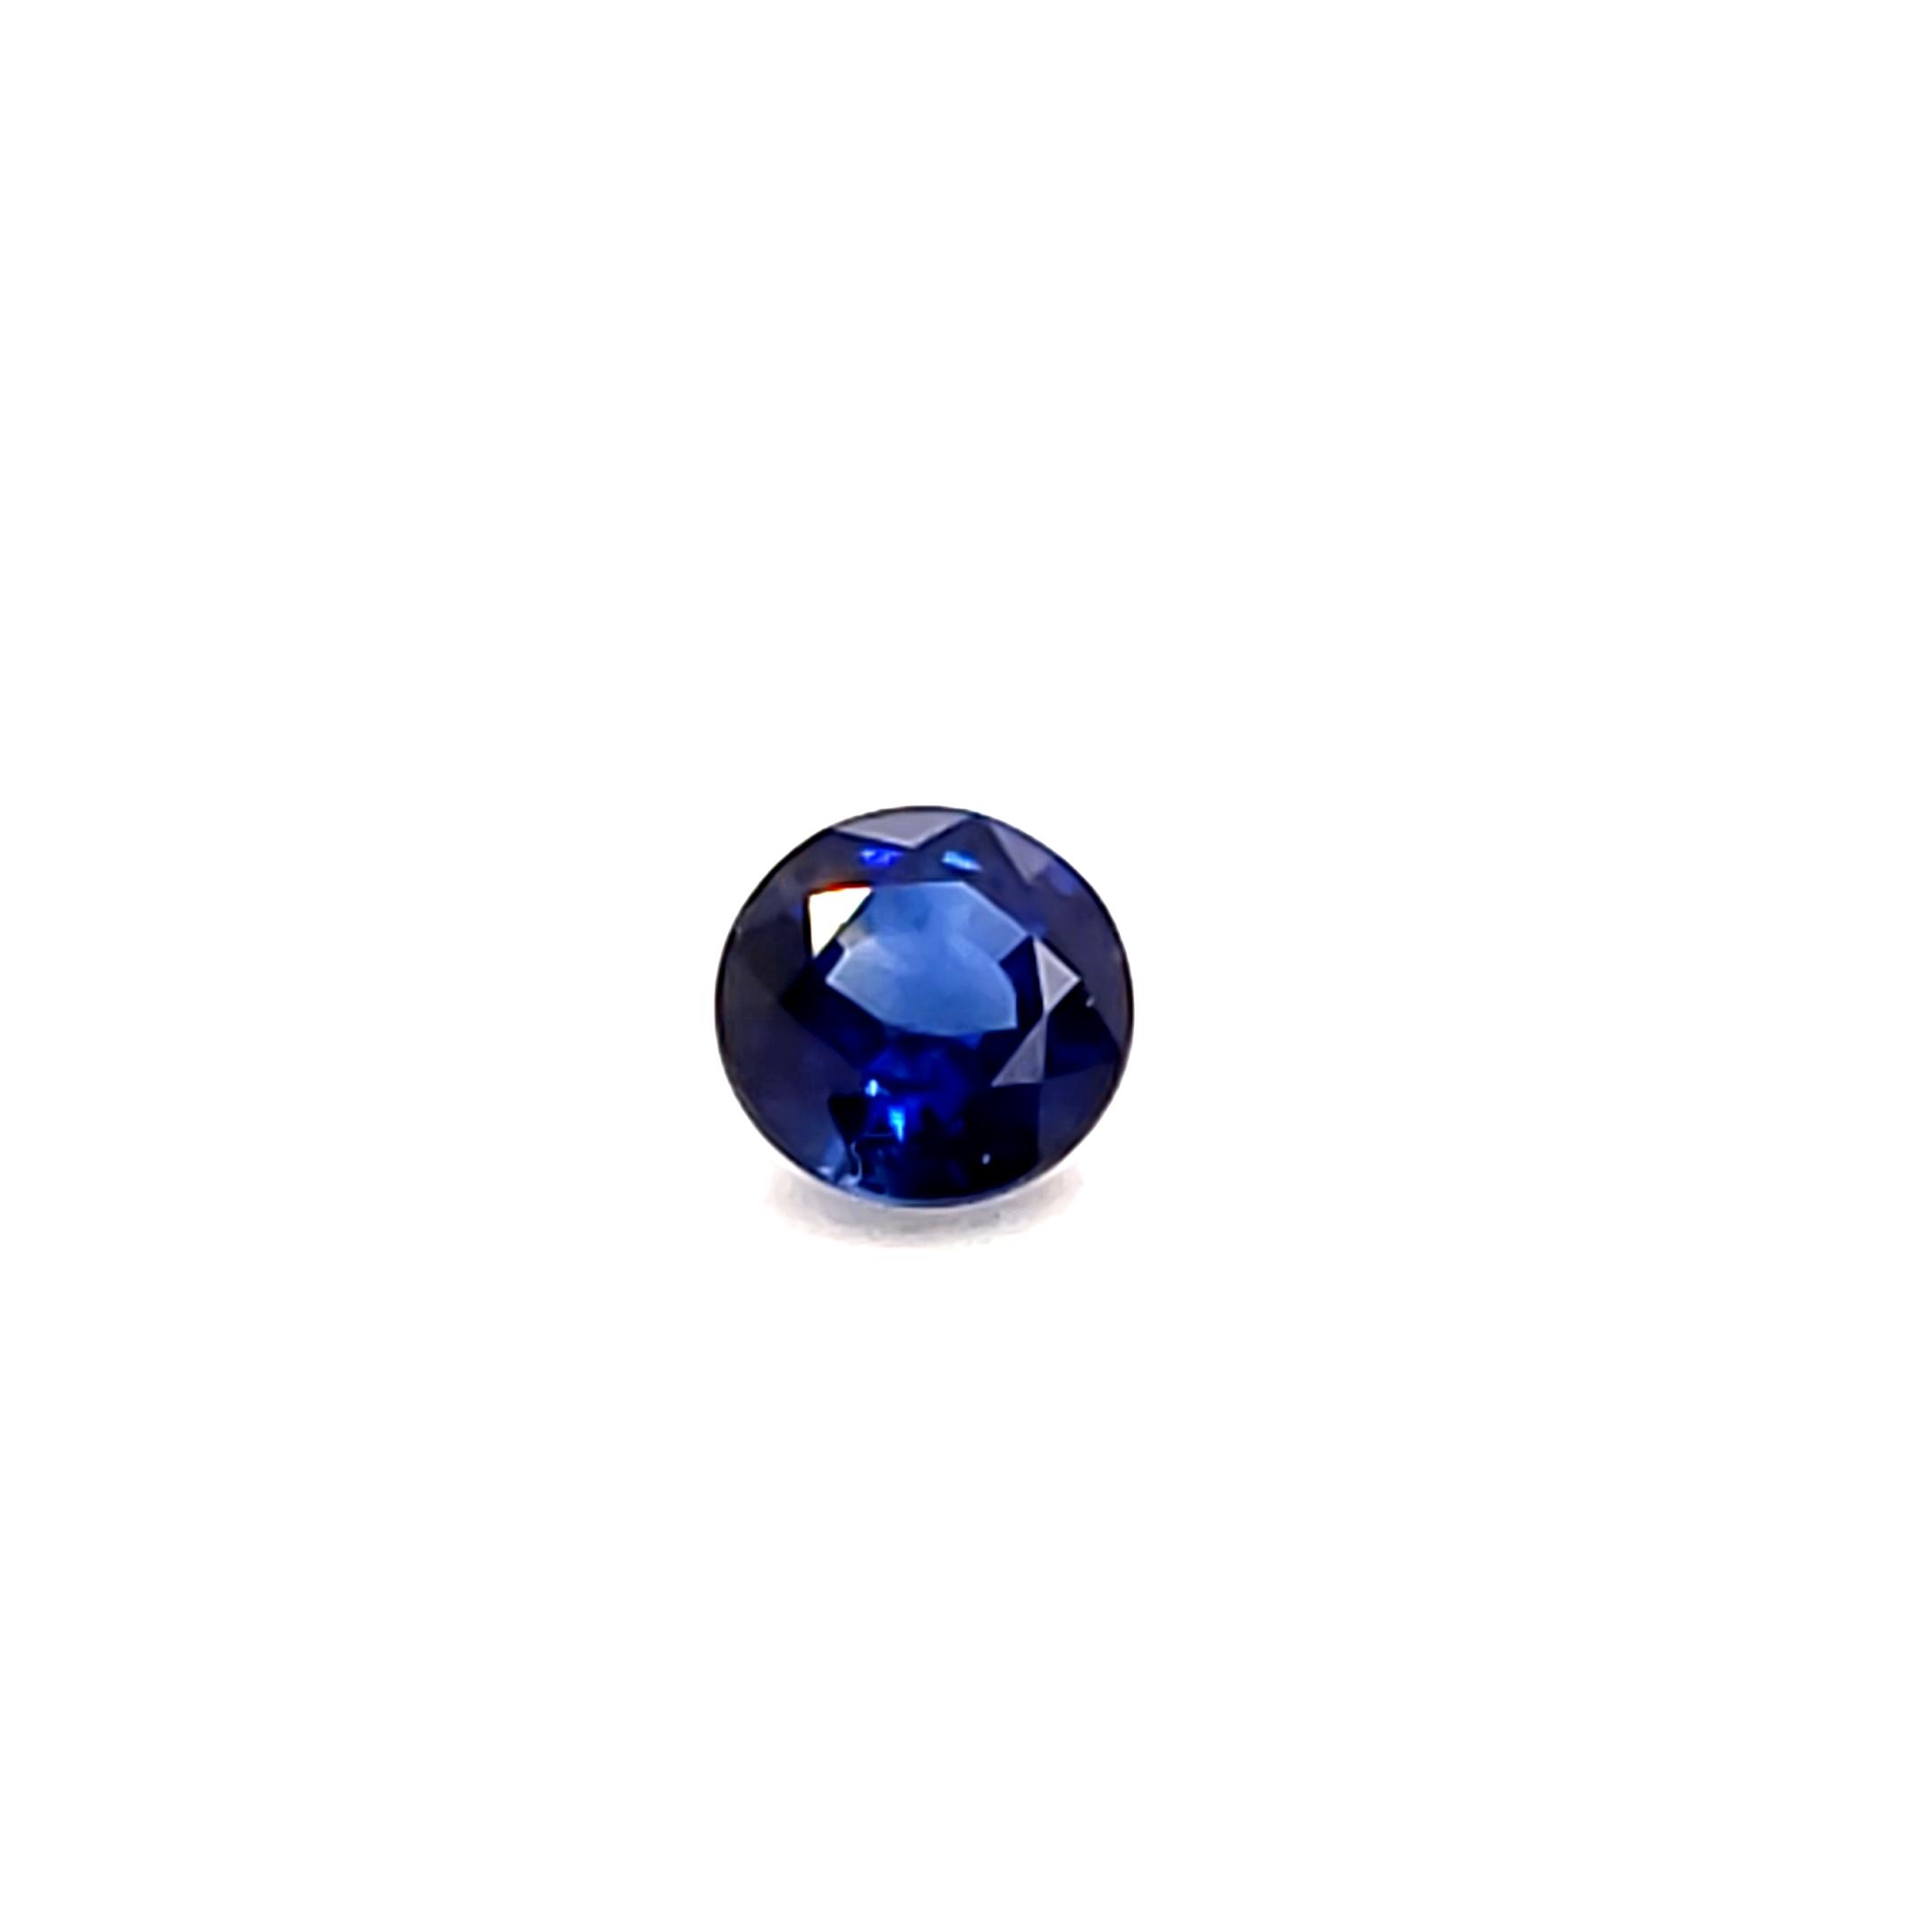 .38 ct. Blue Sapphire